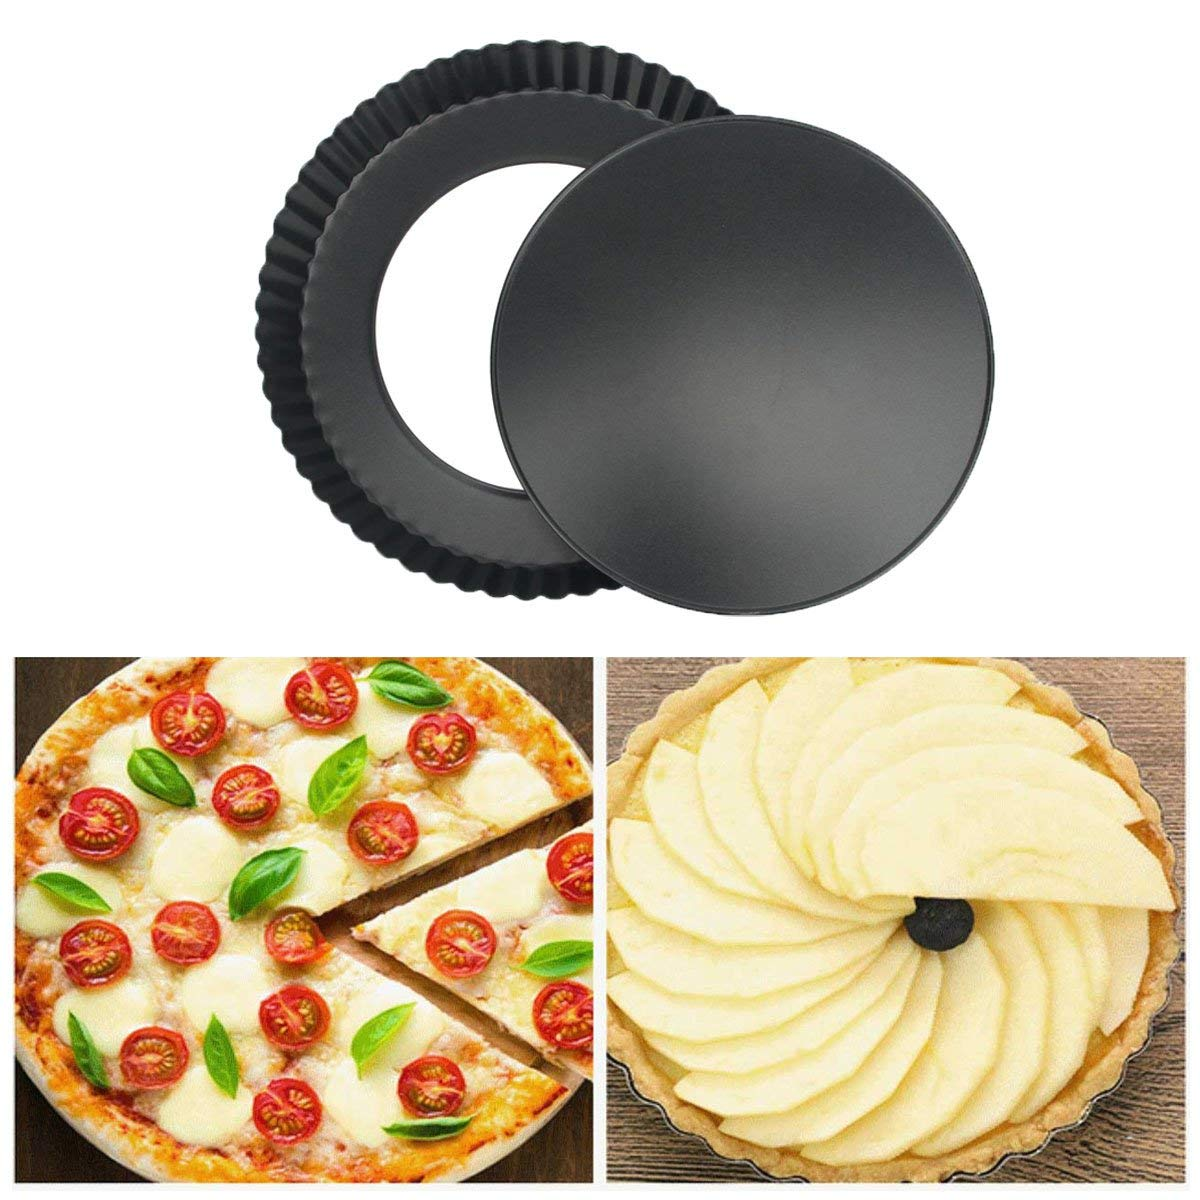 Removable bottom tart pans theme